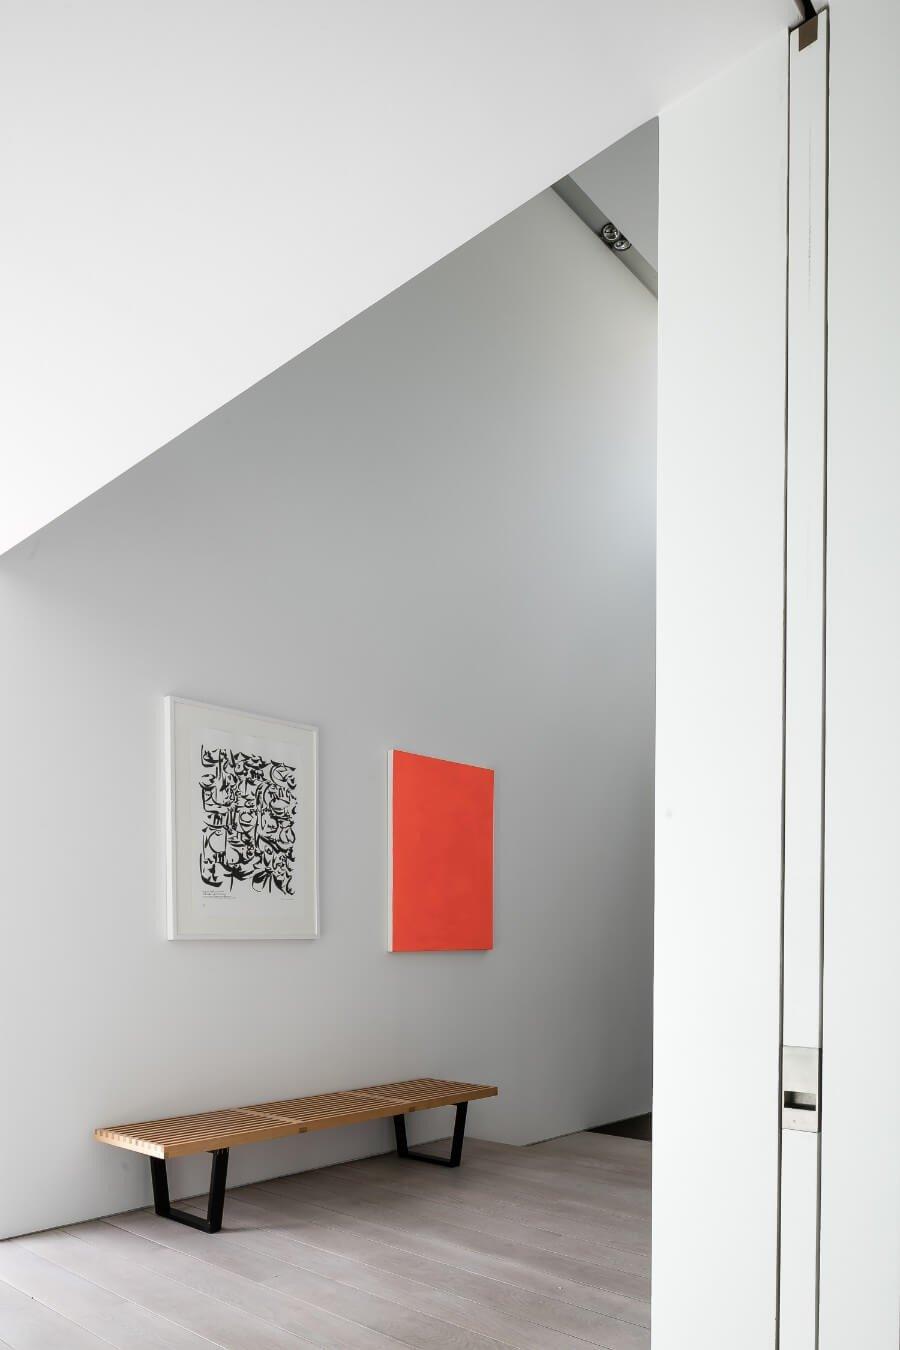 House-MP-Rietveldprojects-Photobycafeine-62